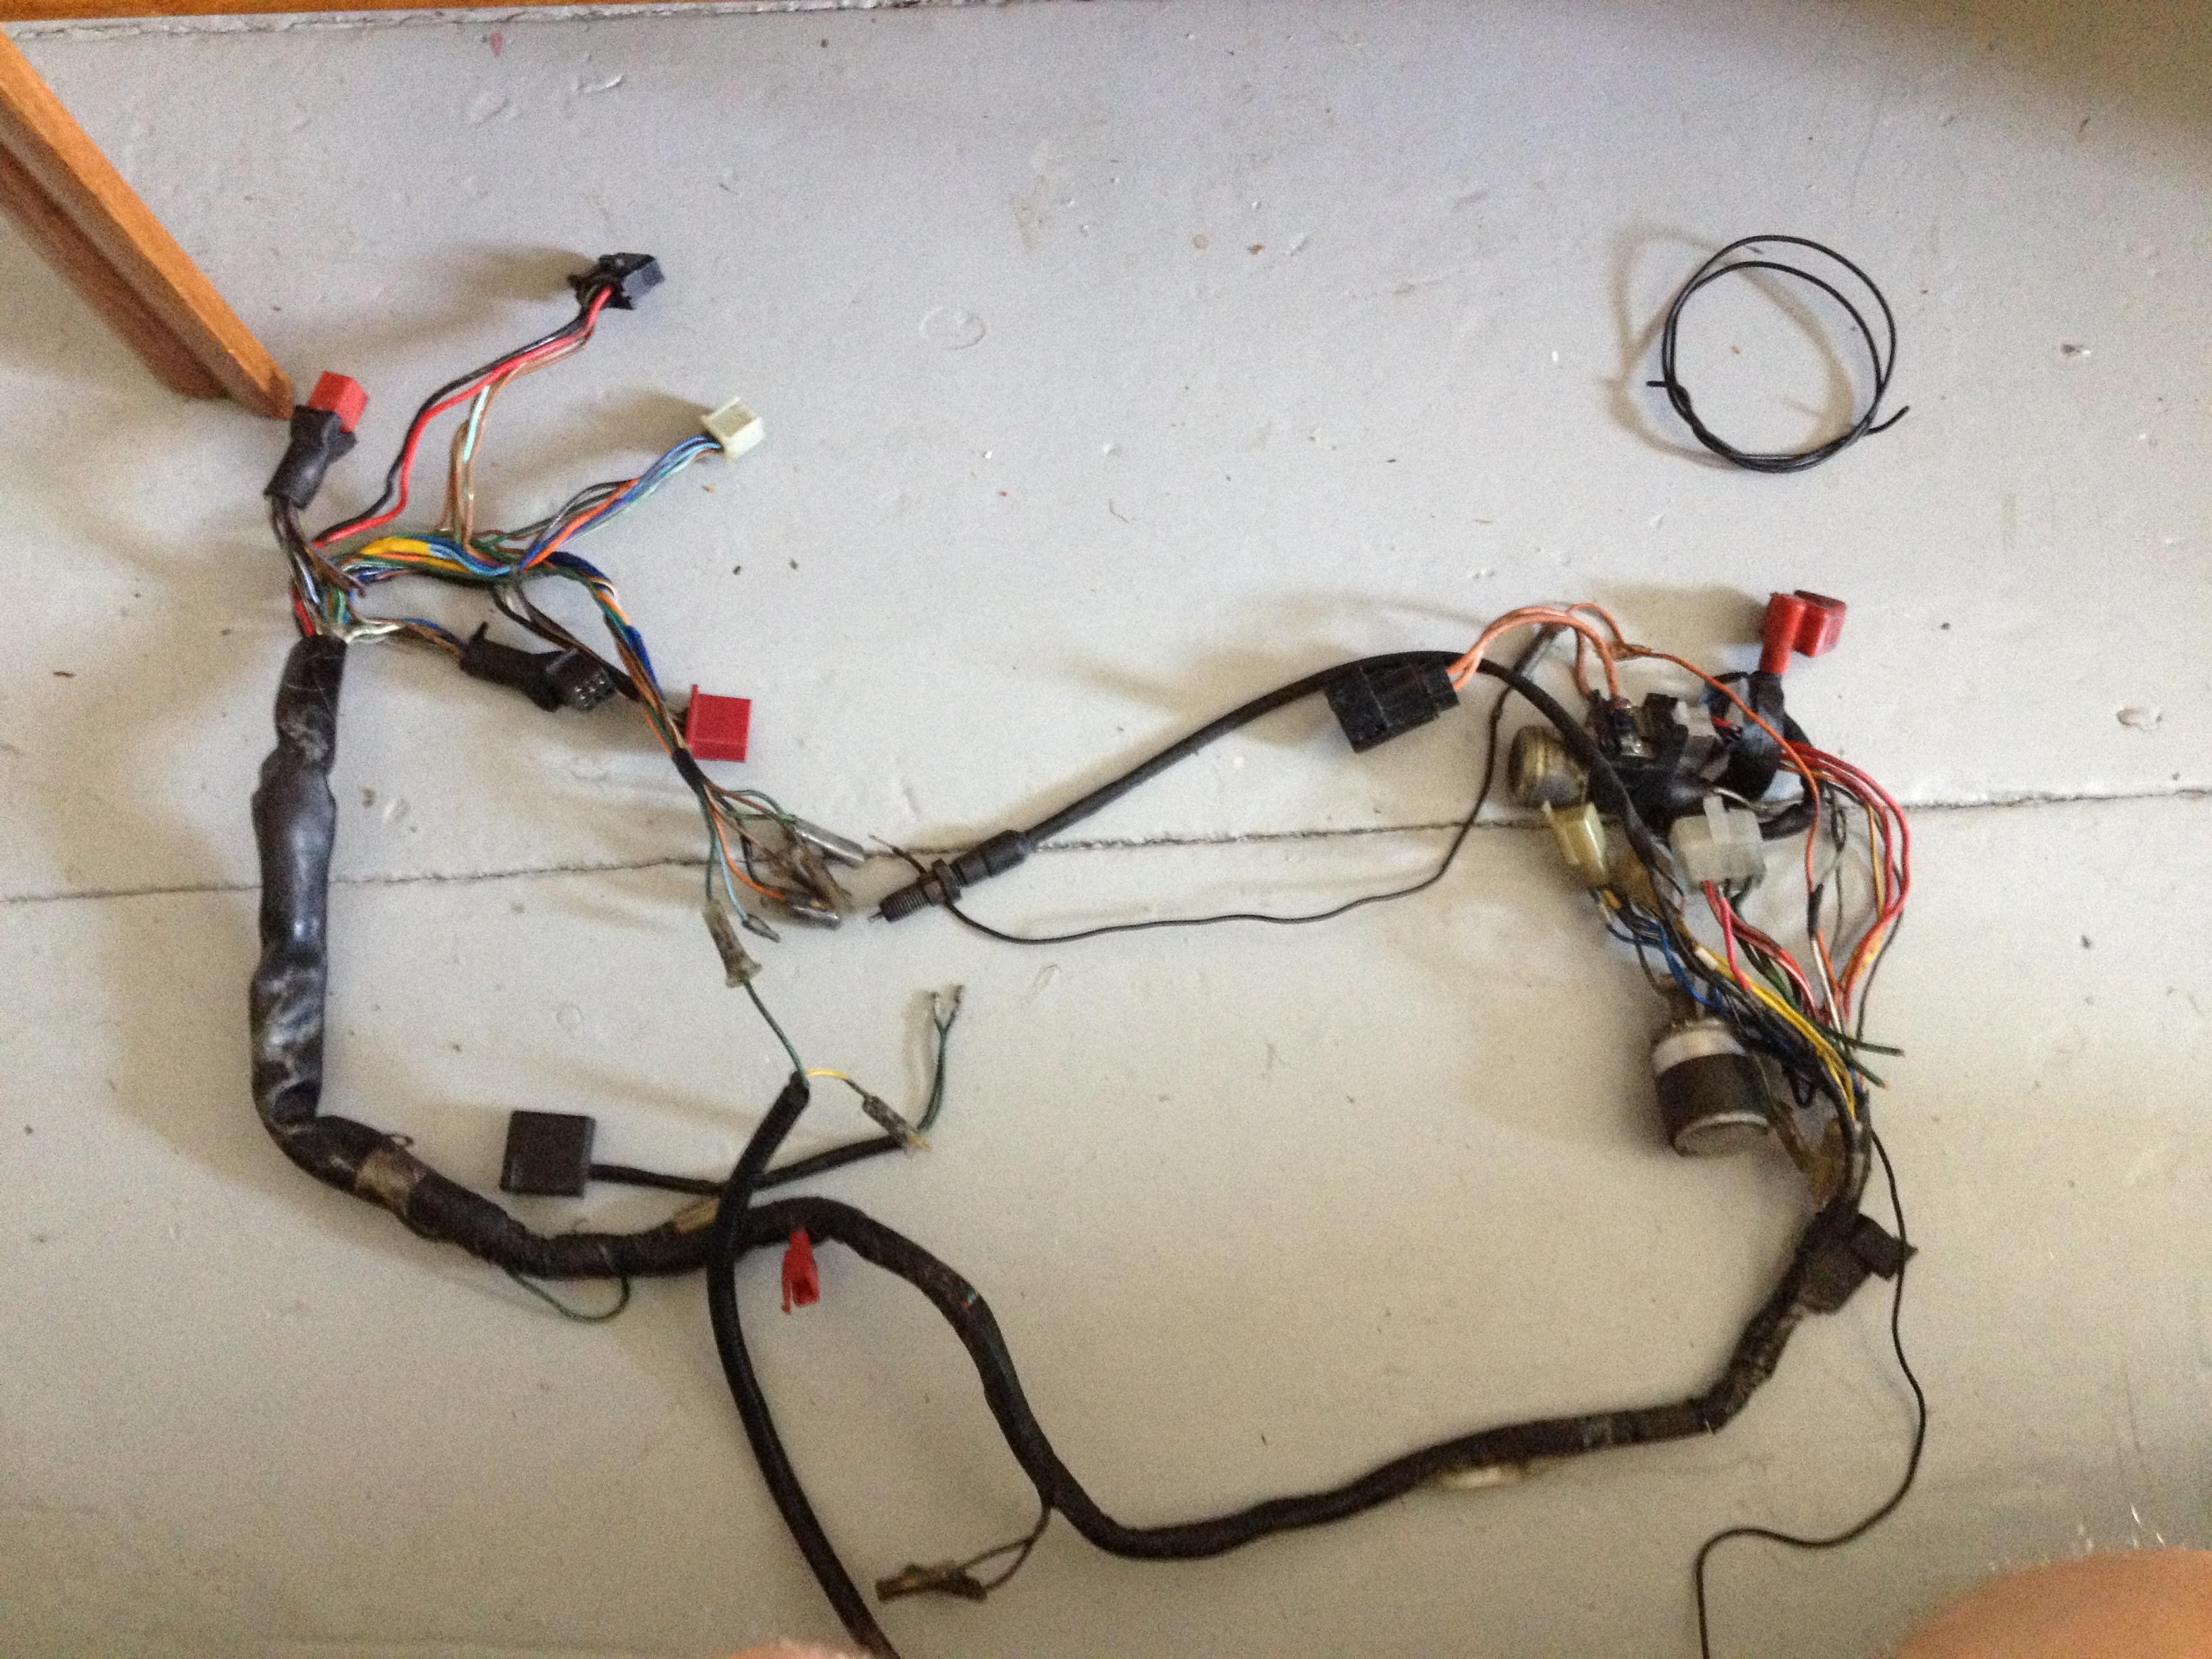 Fios Cat5e Wiring Diagram Free Download Wiring Diagram Schematic